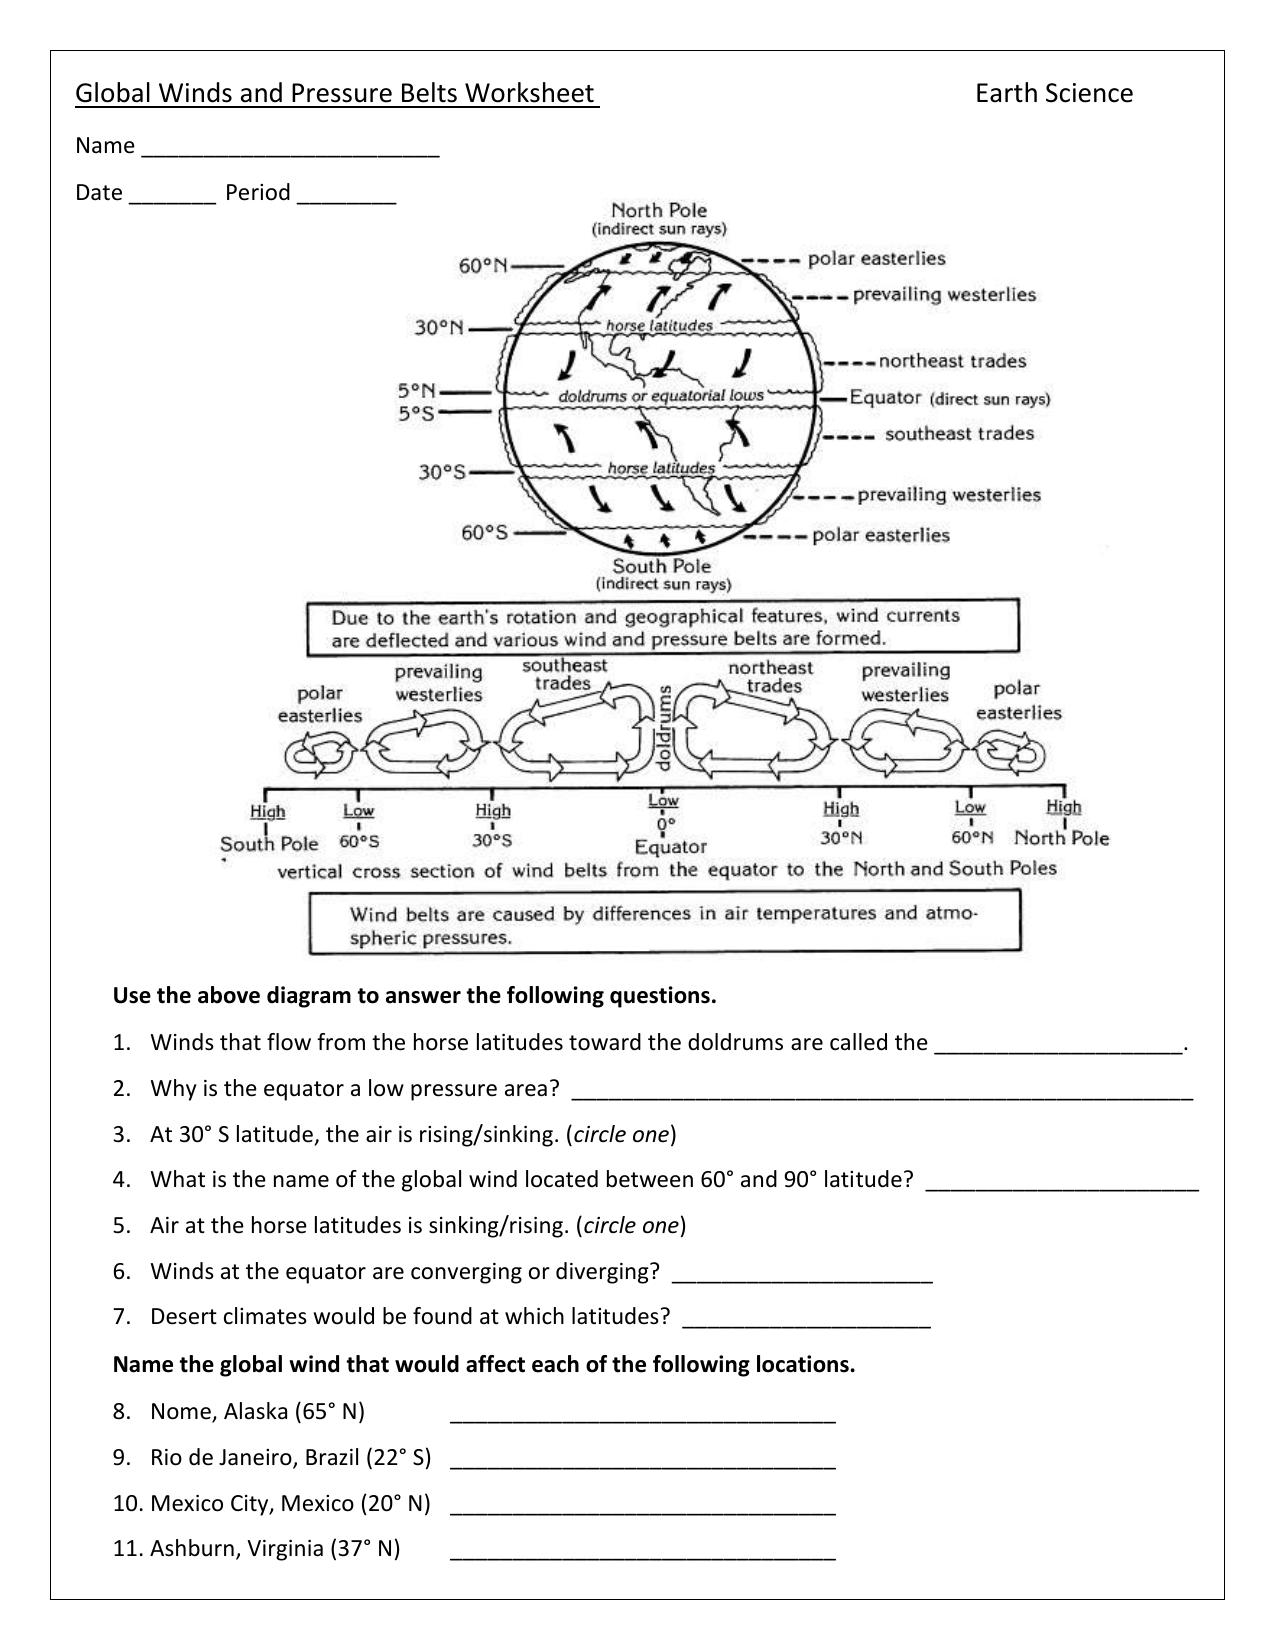 Worksheets Global Winds Worksheet global winds and pressure belts worksheet earth science